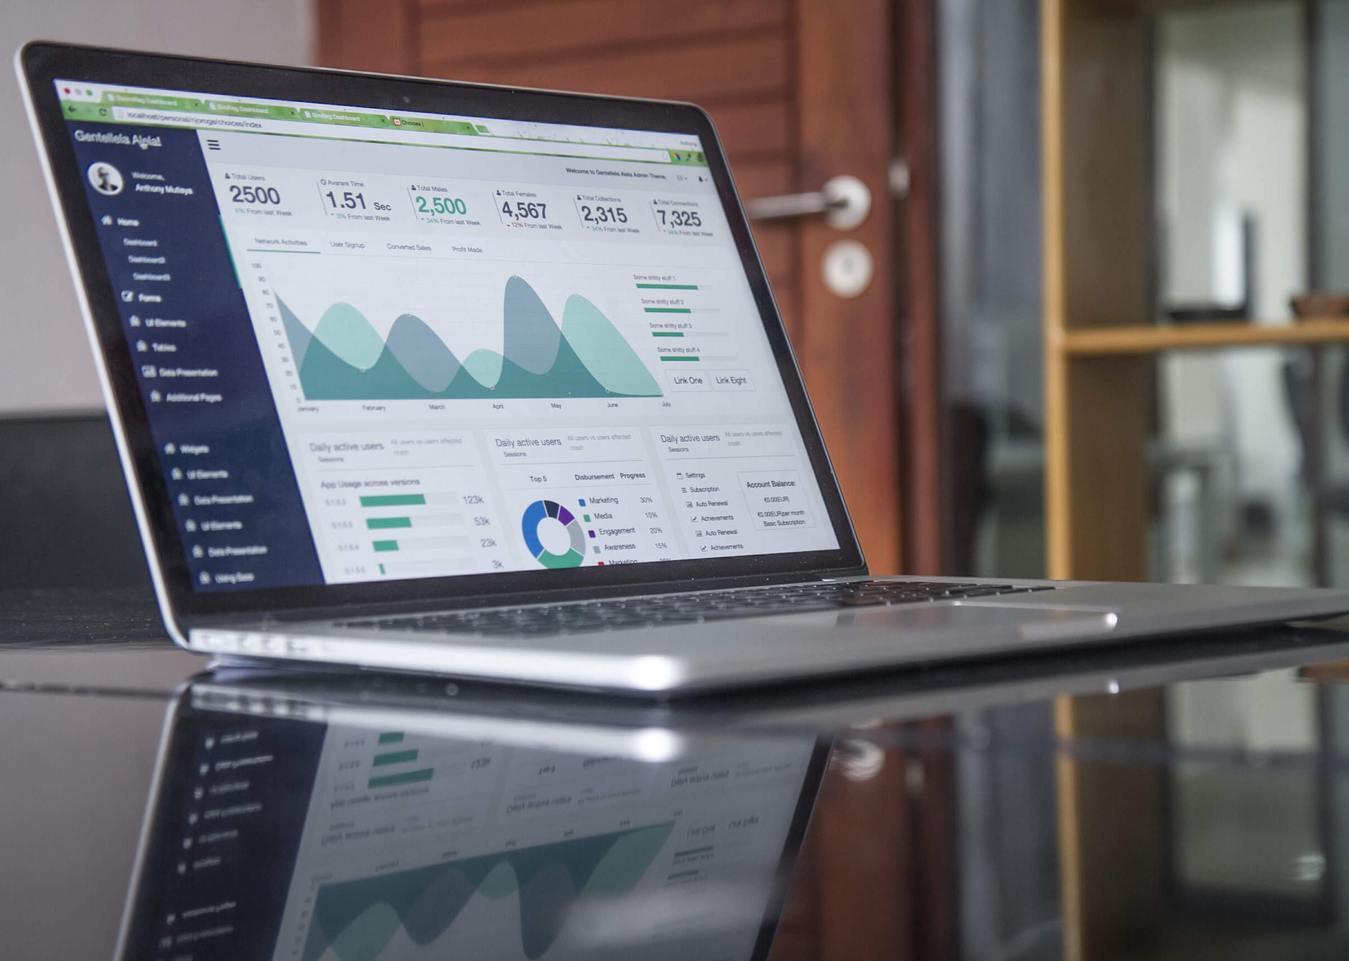 Optimierungs-Grafik auf Laptop